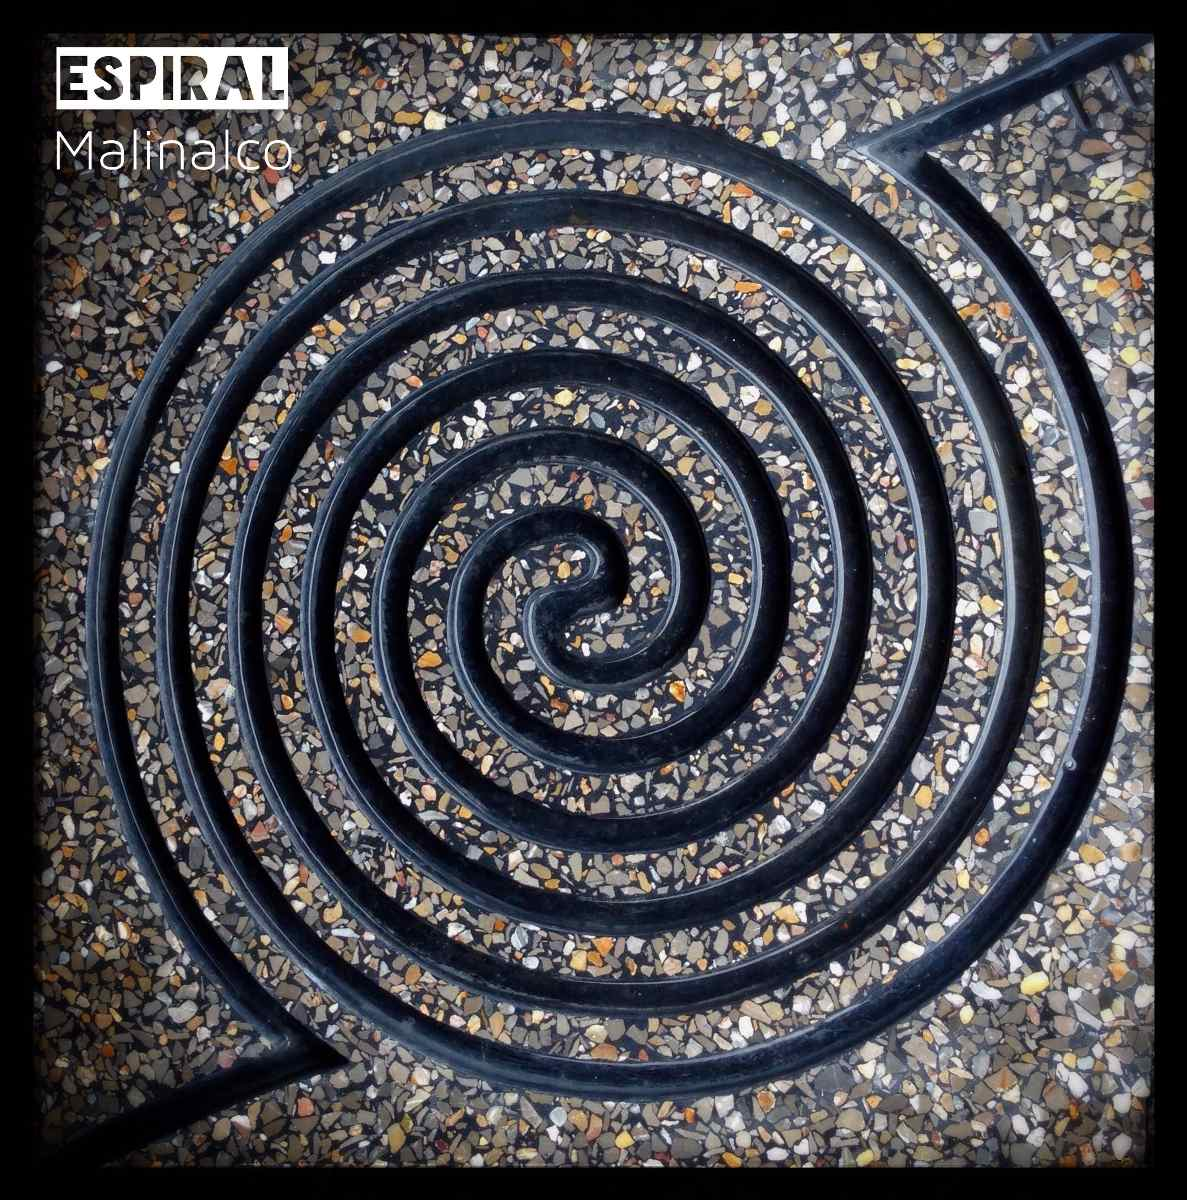 loseta espiral para decoracin